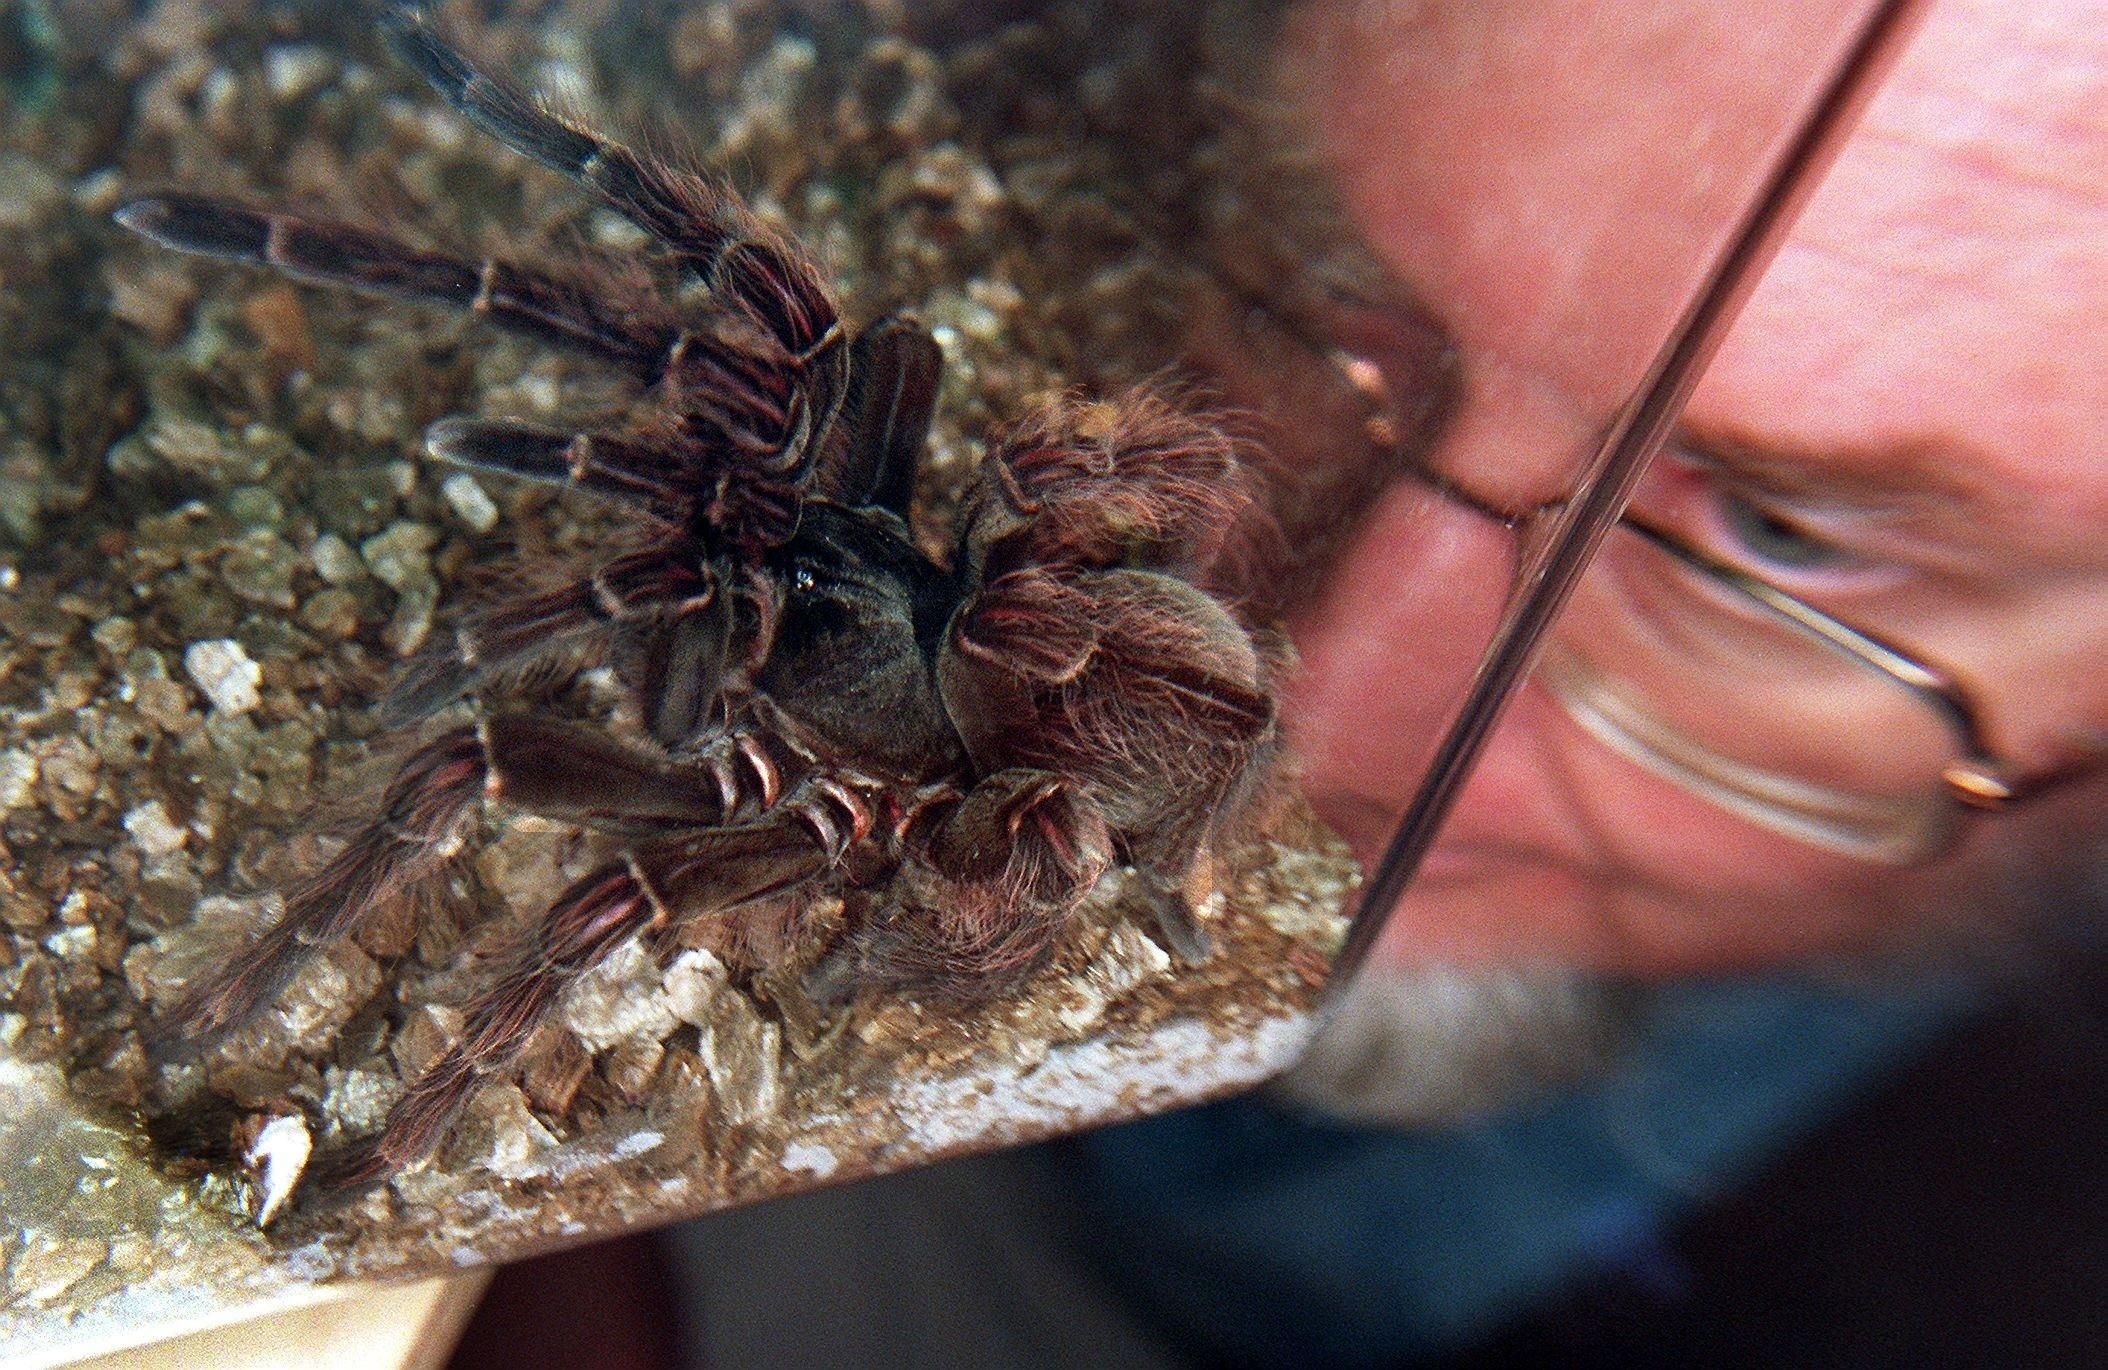 Tarantula eating bird